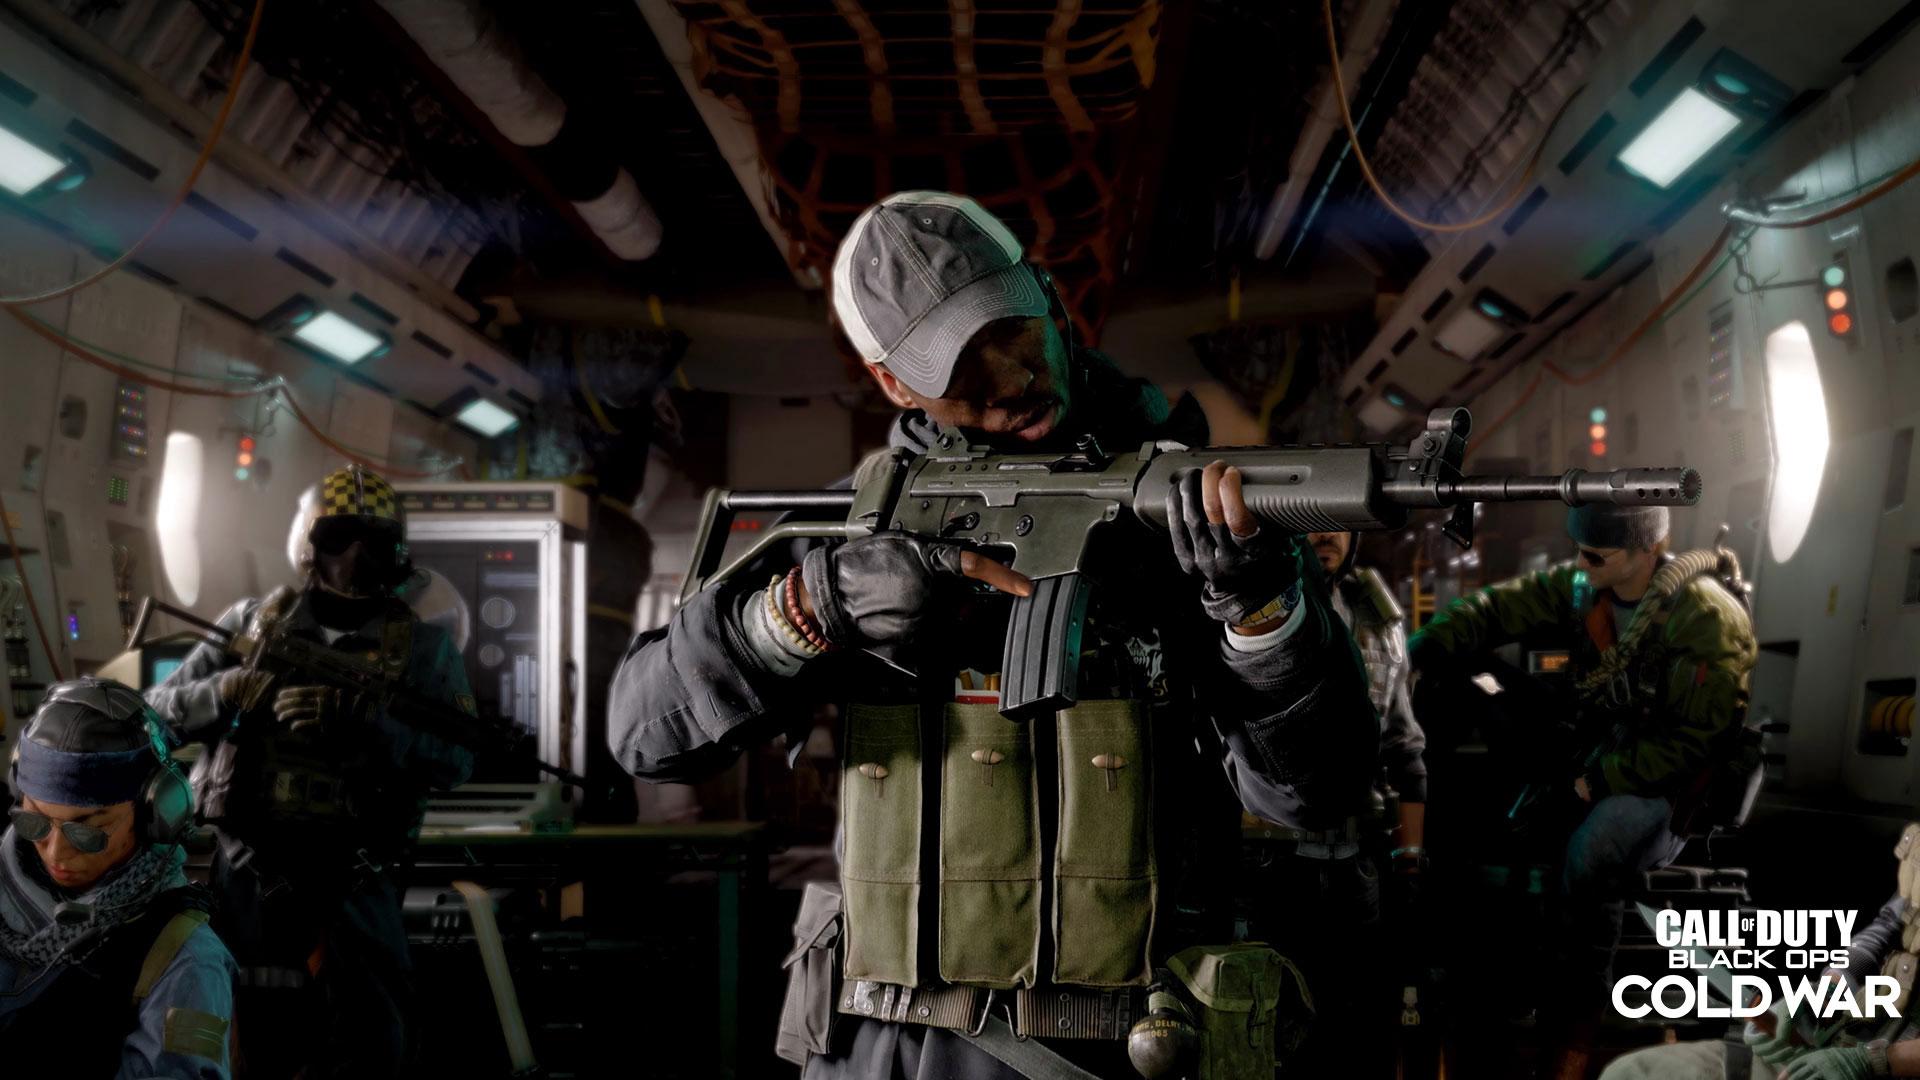 Black Ops Cold War XM4 in plane